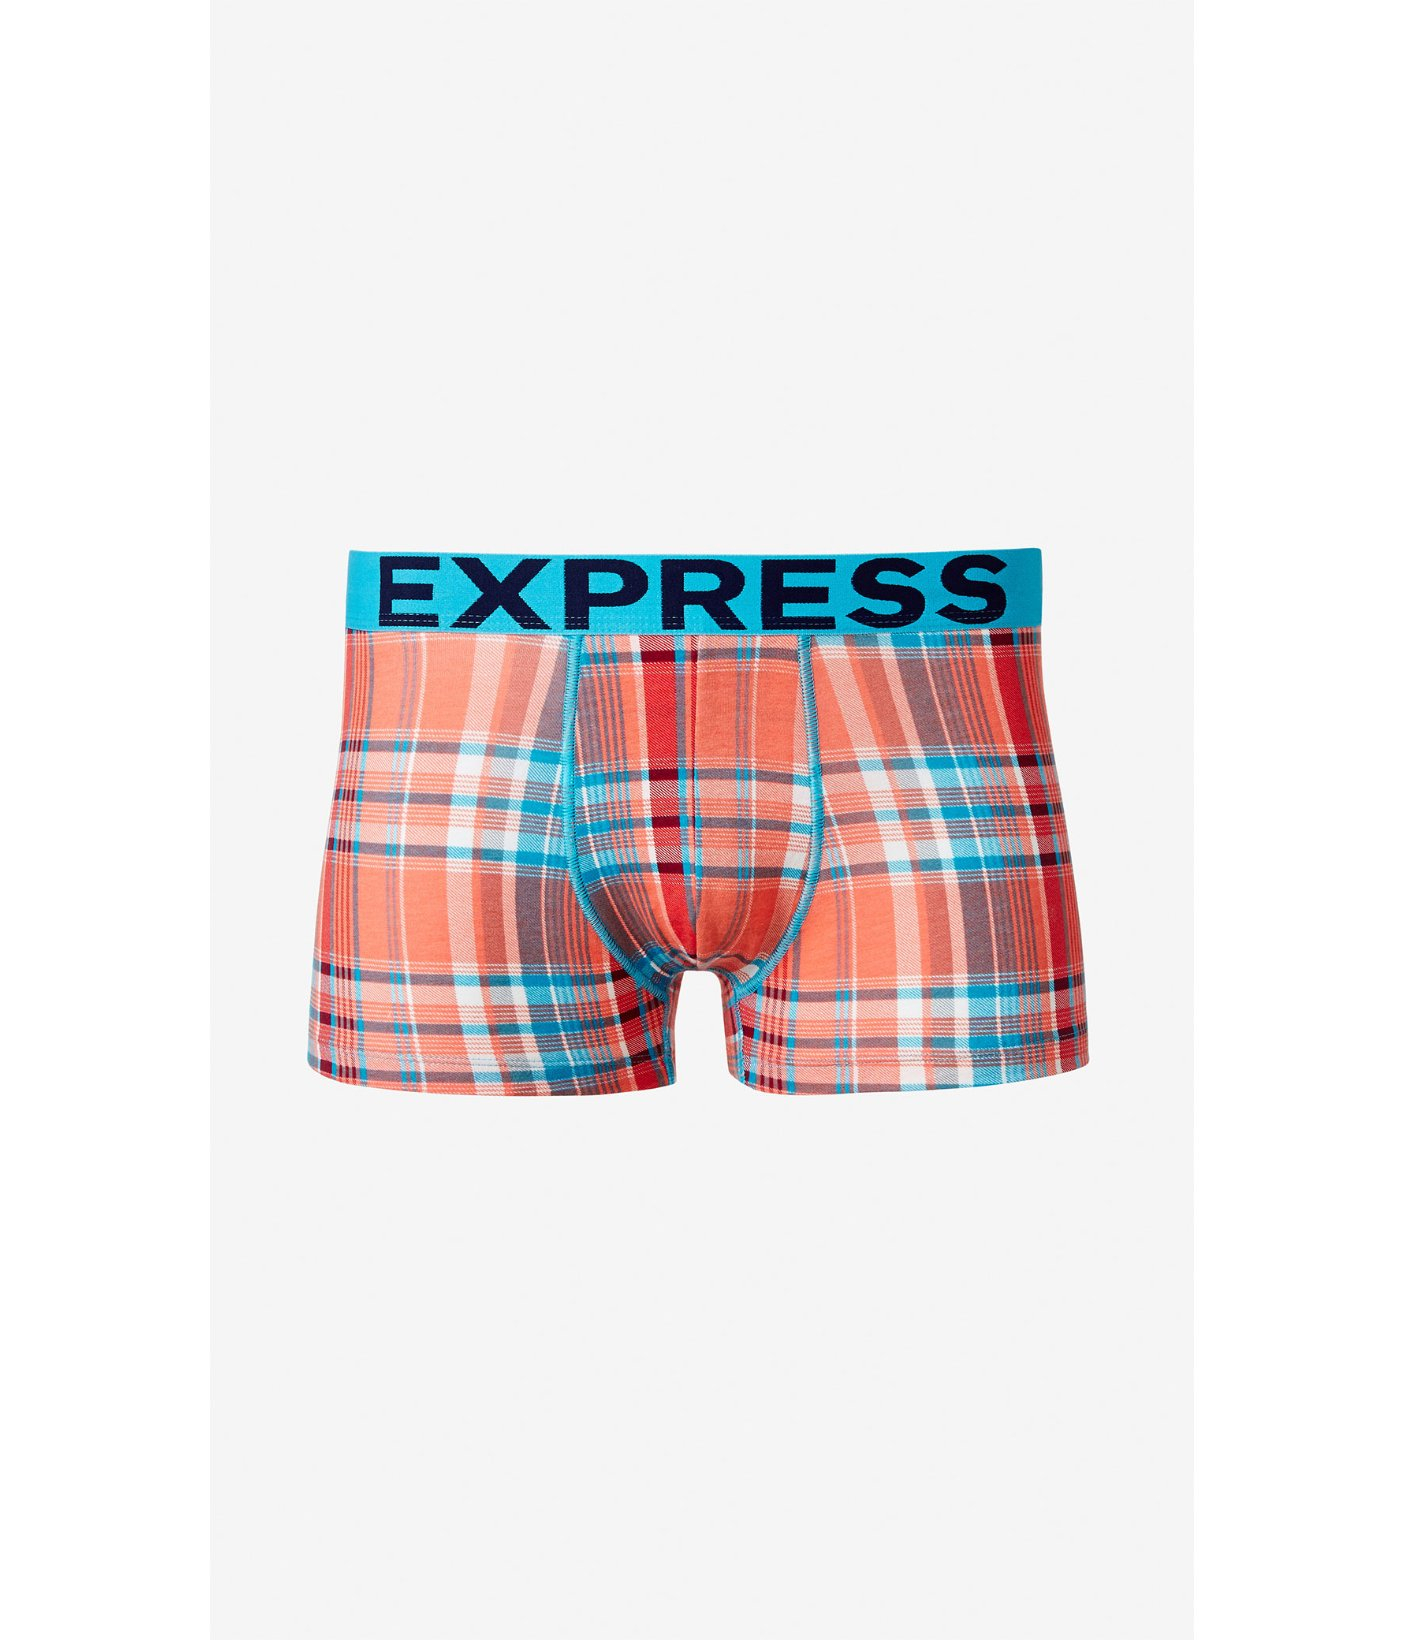 Lyst - Express Multicolor Plaid Knit Sport Trunks in Orange for Men 1e17093da10